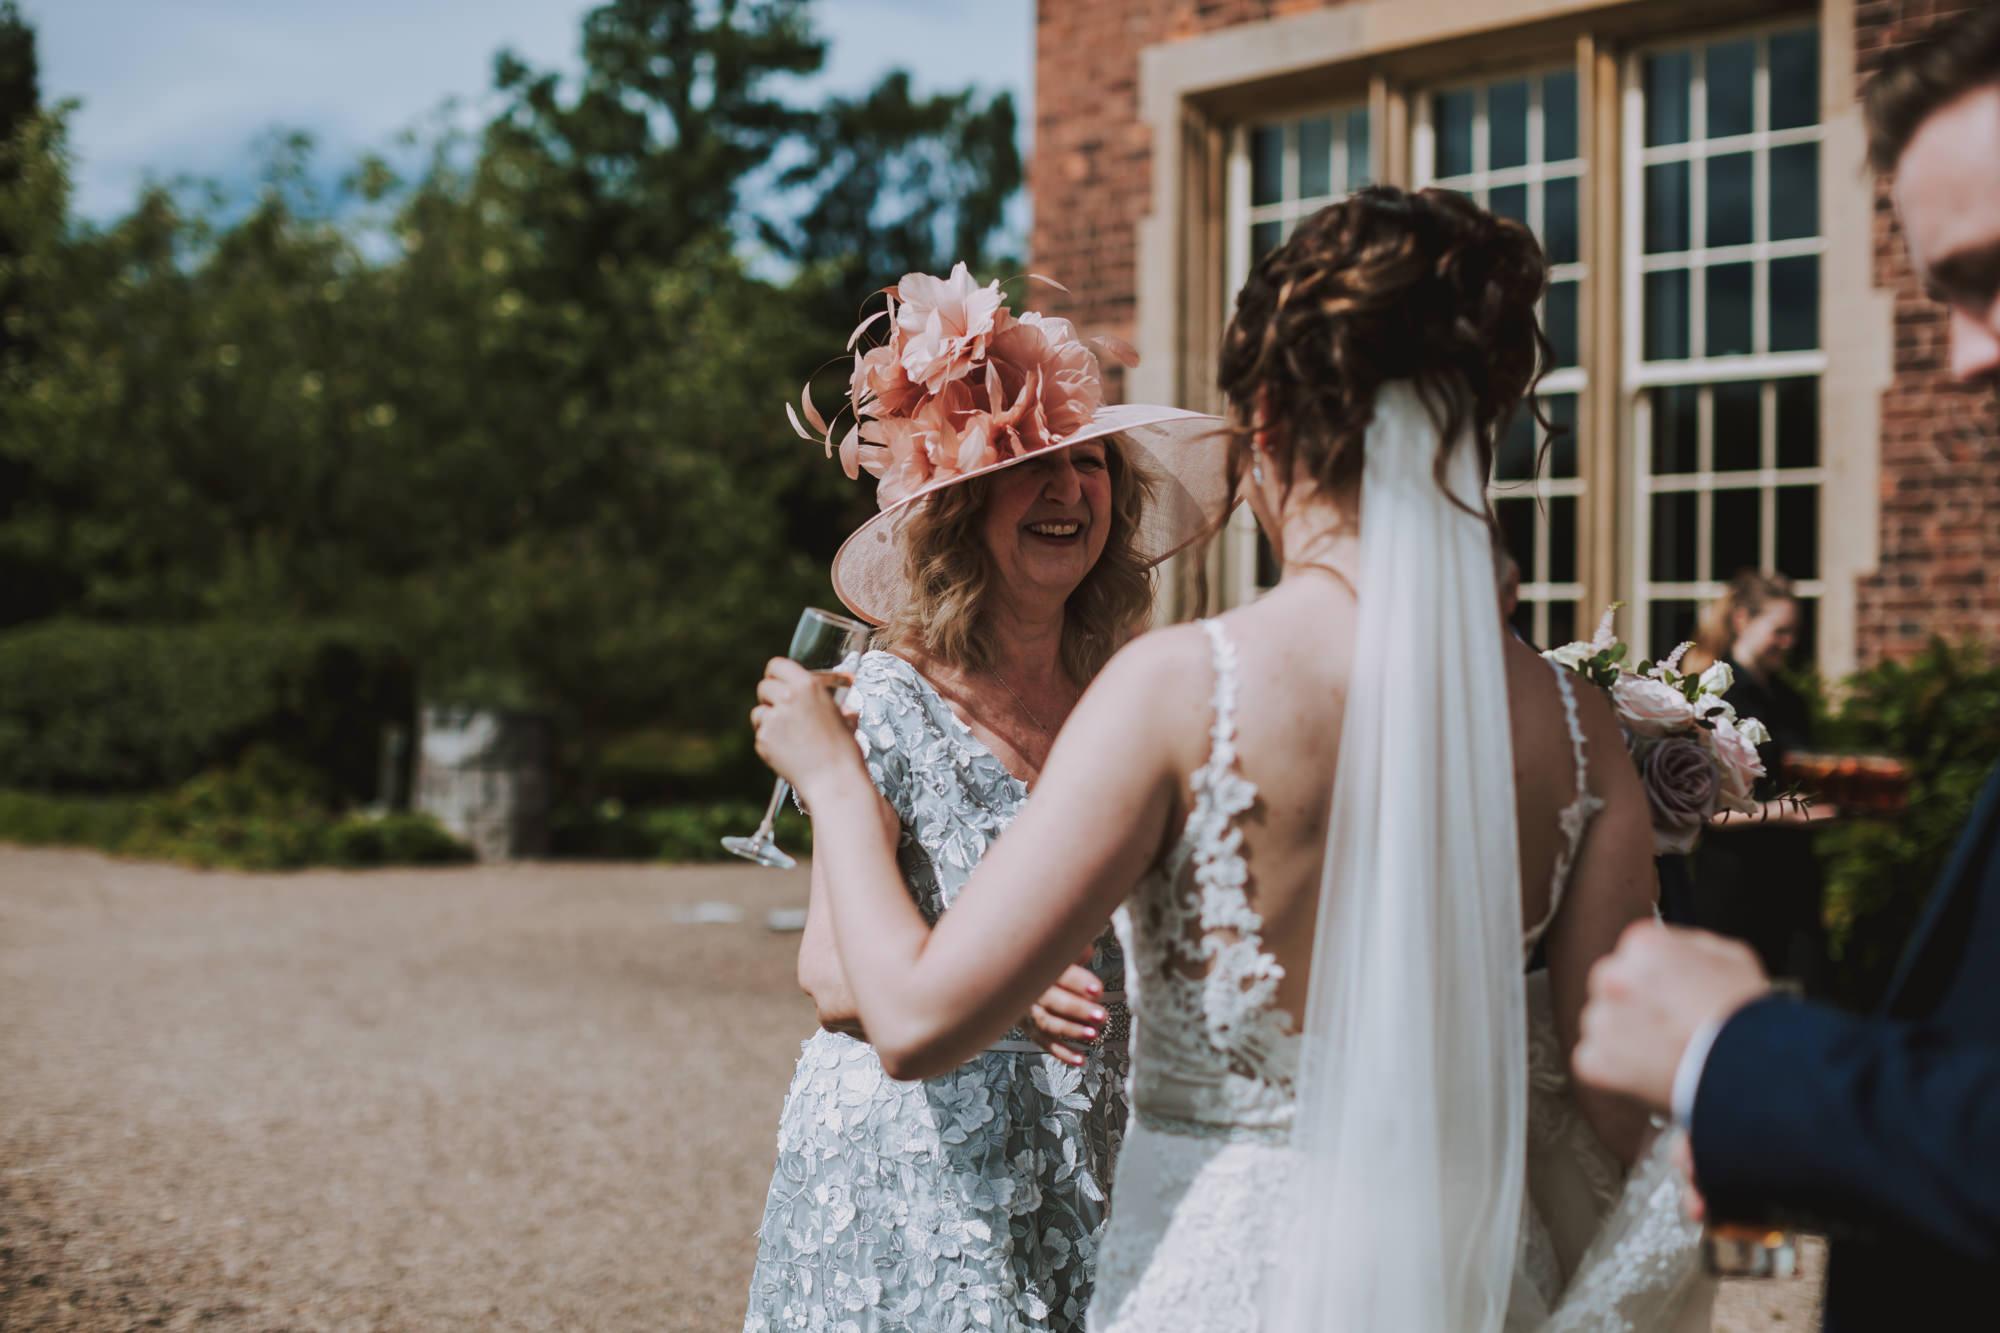 hodsock priory wedding photographers blog47.jpg